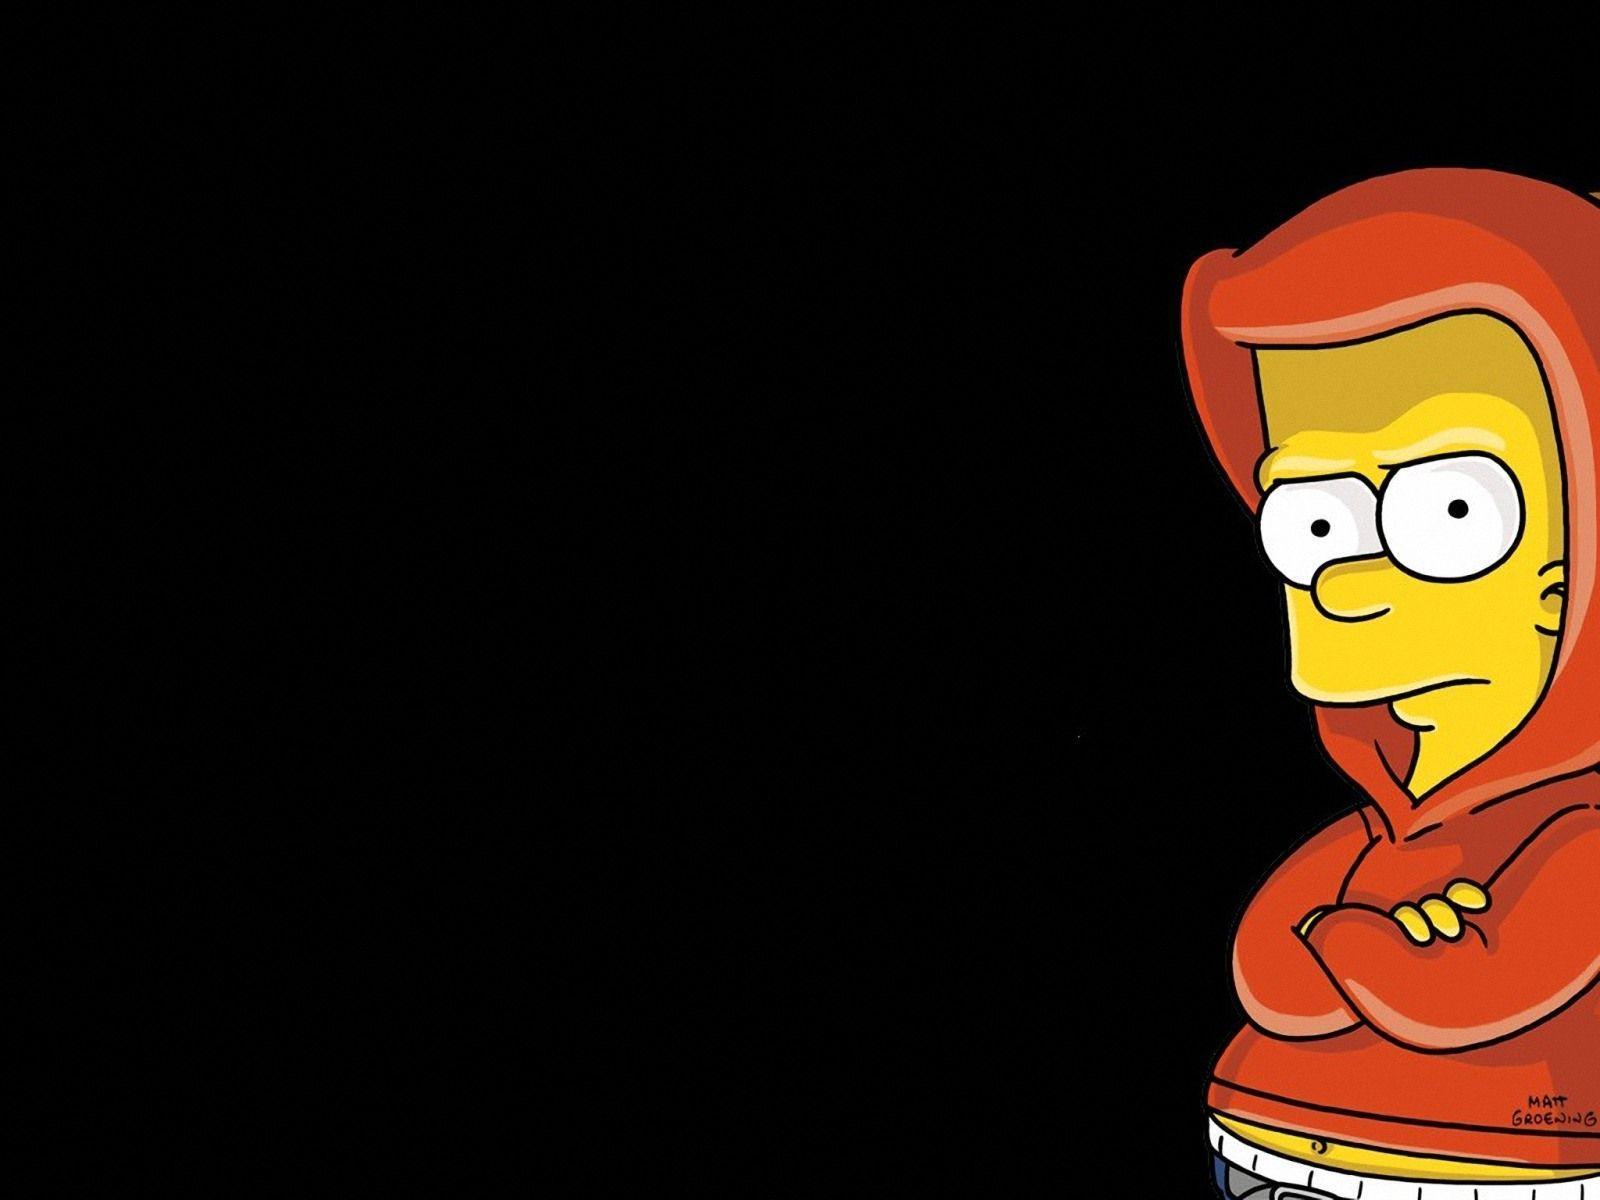 Black bart simpson clipart svg library Black Bart Simpson Wallpapers - Top Free Black Bart Simpson ... svg library